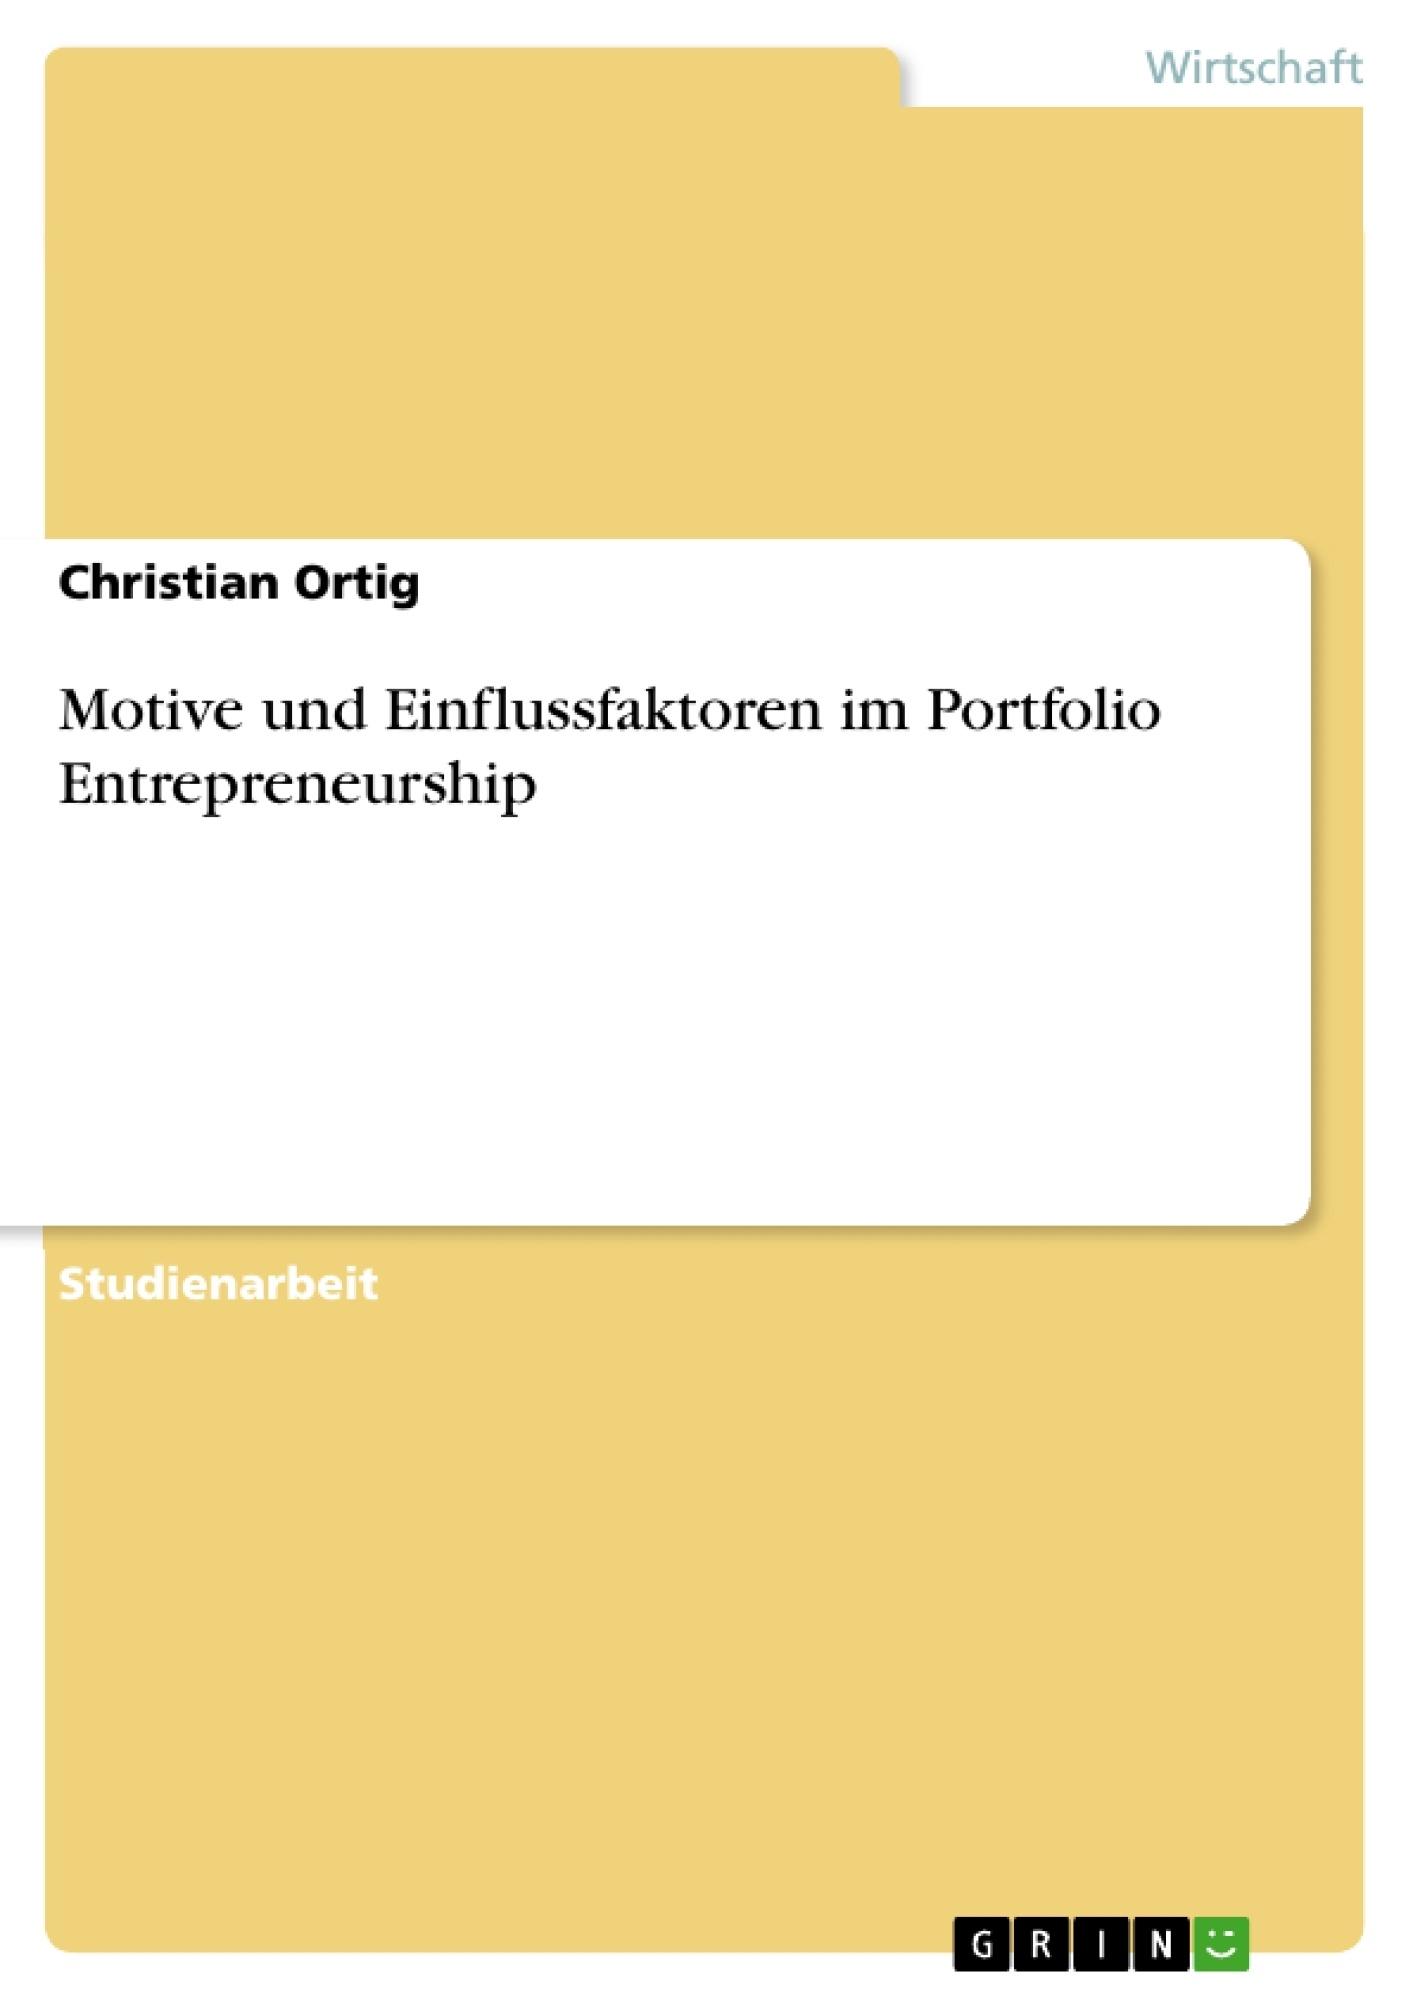 Titel: Motive und Einflussfaktoren im Portfolio Entrepreneurship